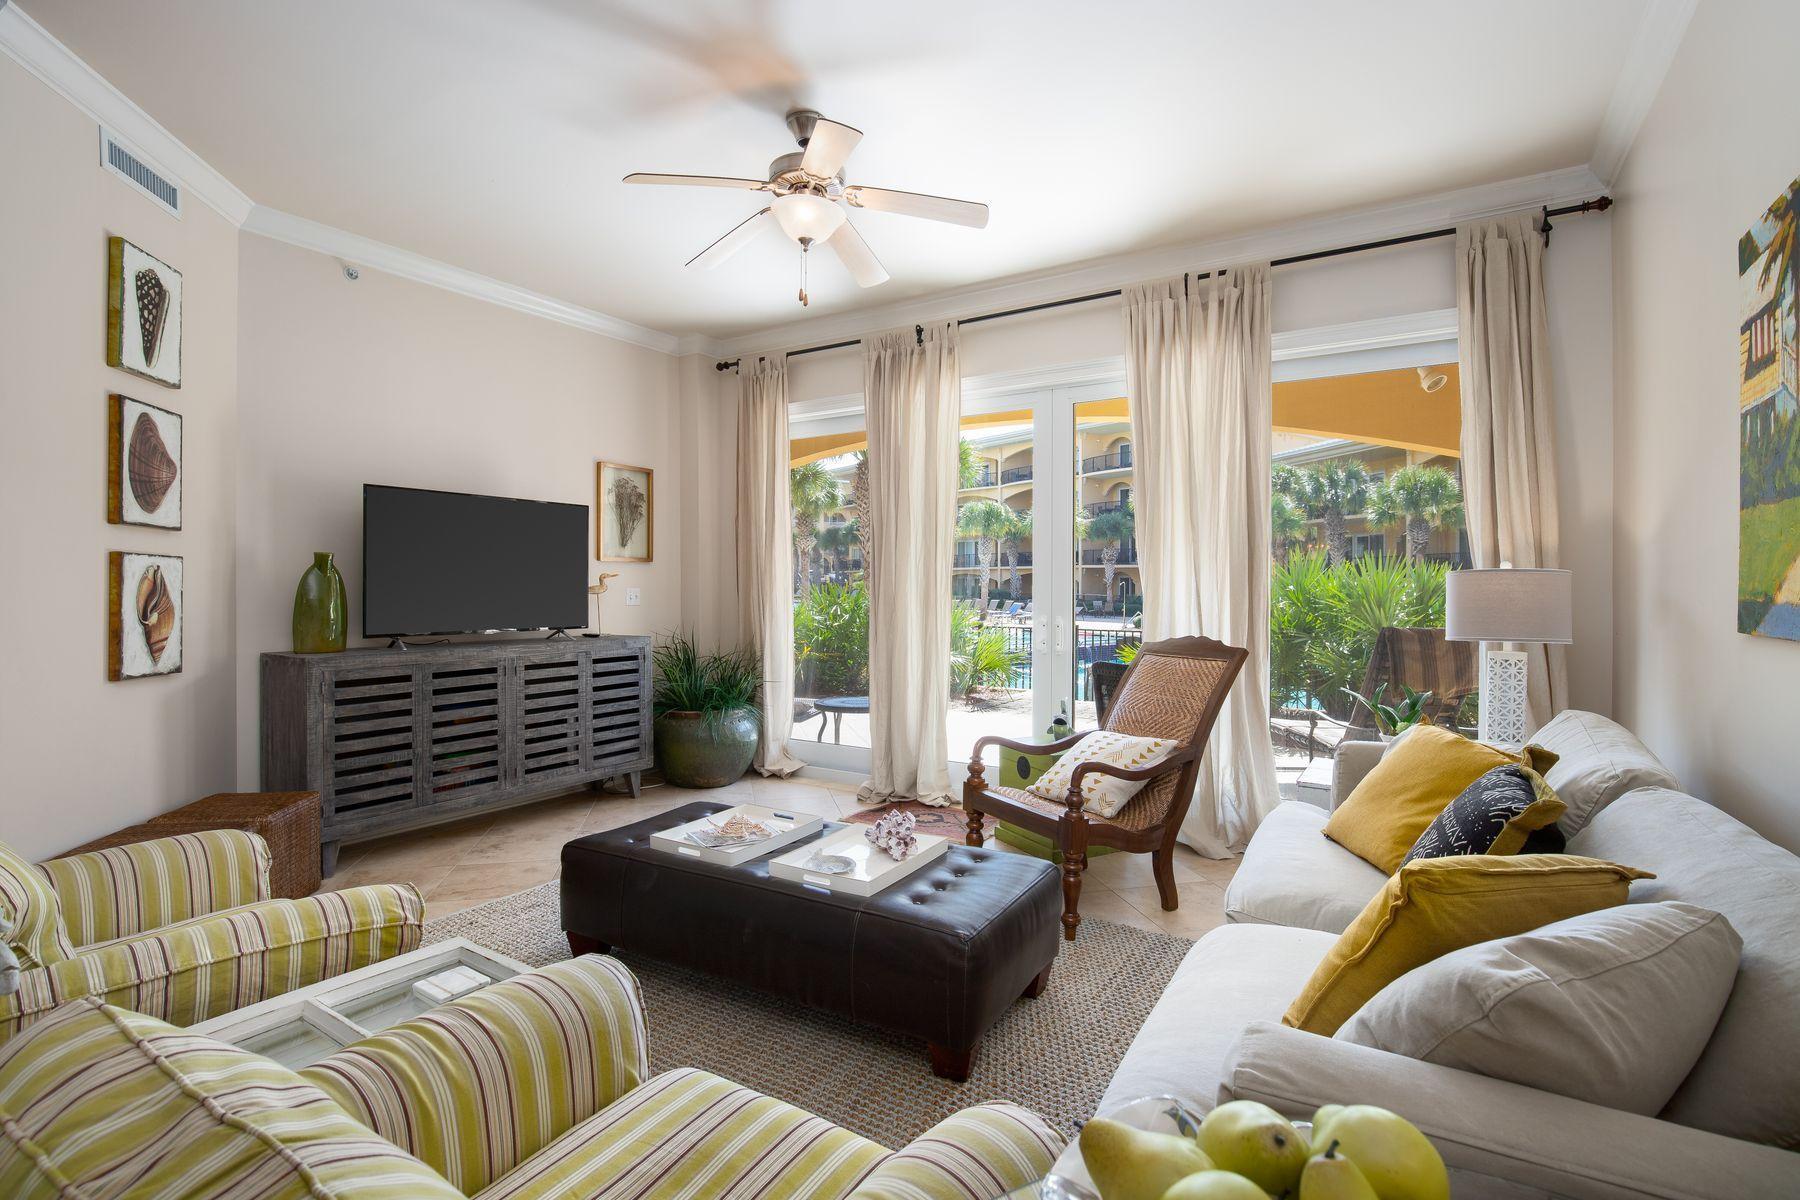 A 3 Bedroom 3 Bedroom Adagio Condominium